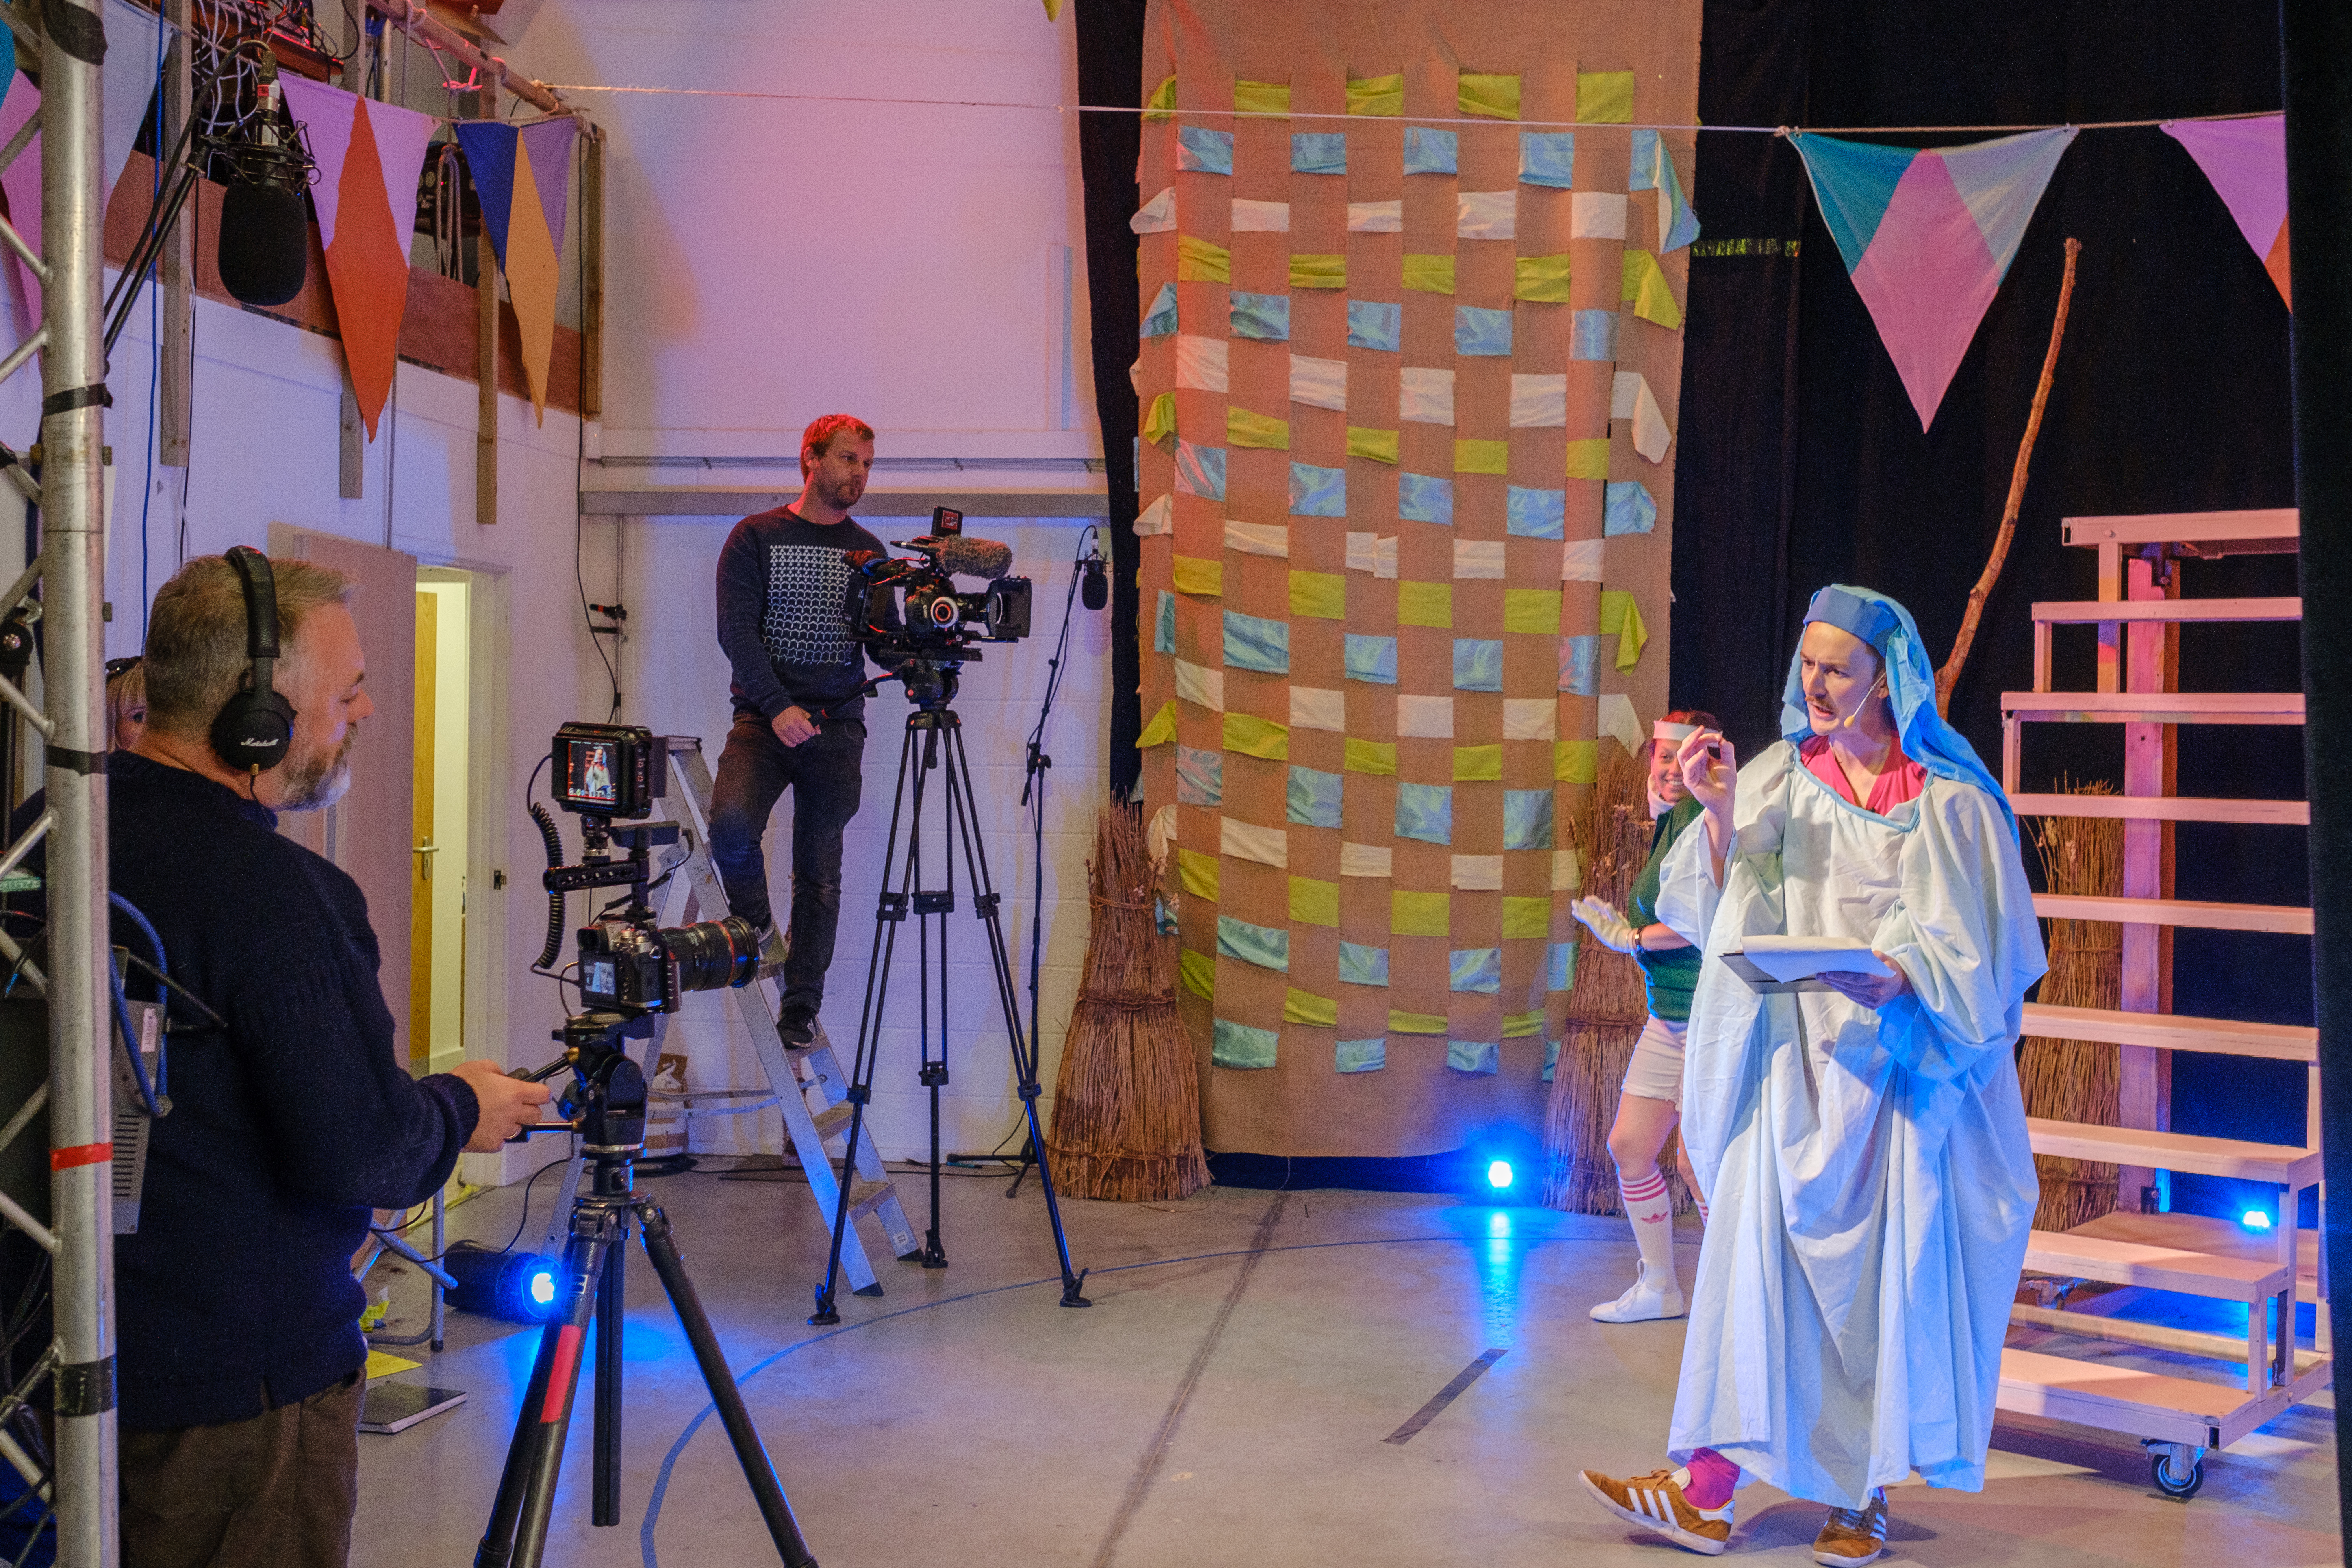 Seamas Carey 'Pagan Pandemonium' film shoot in the Production Space